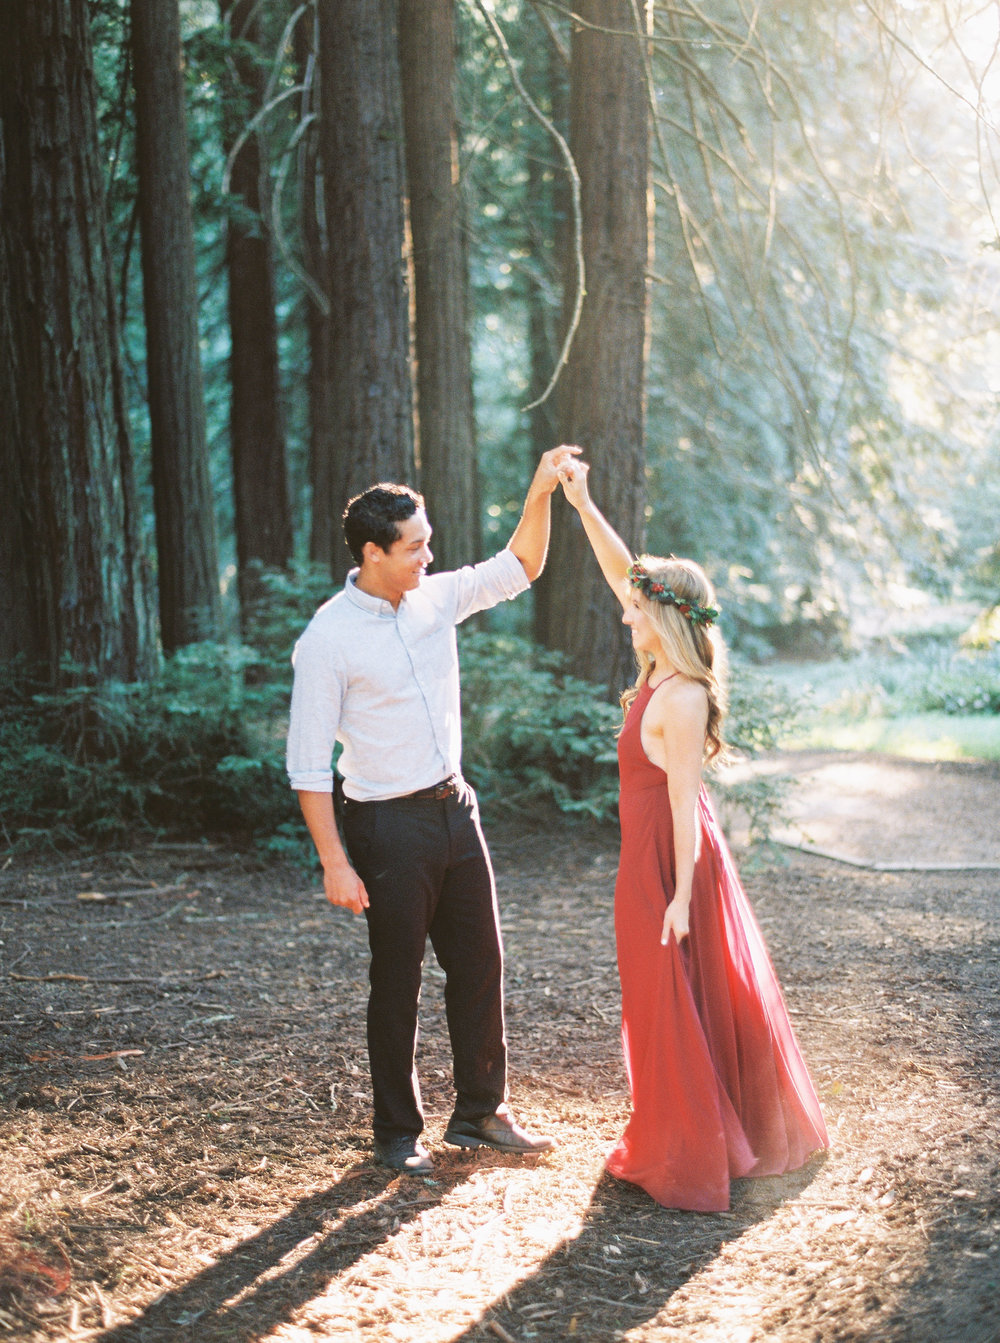 redwood-forest-engagement-in-oakland-california-105.jpg